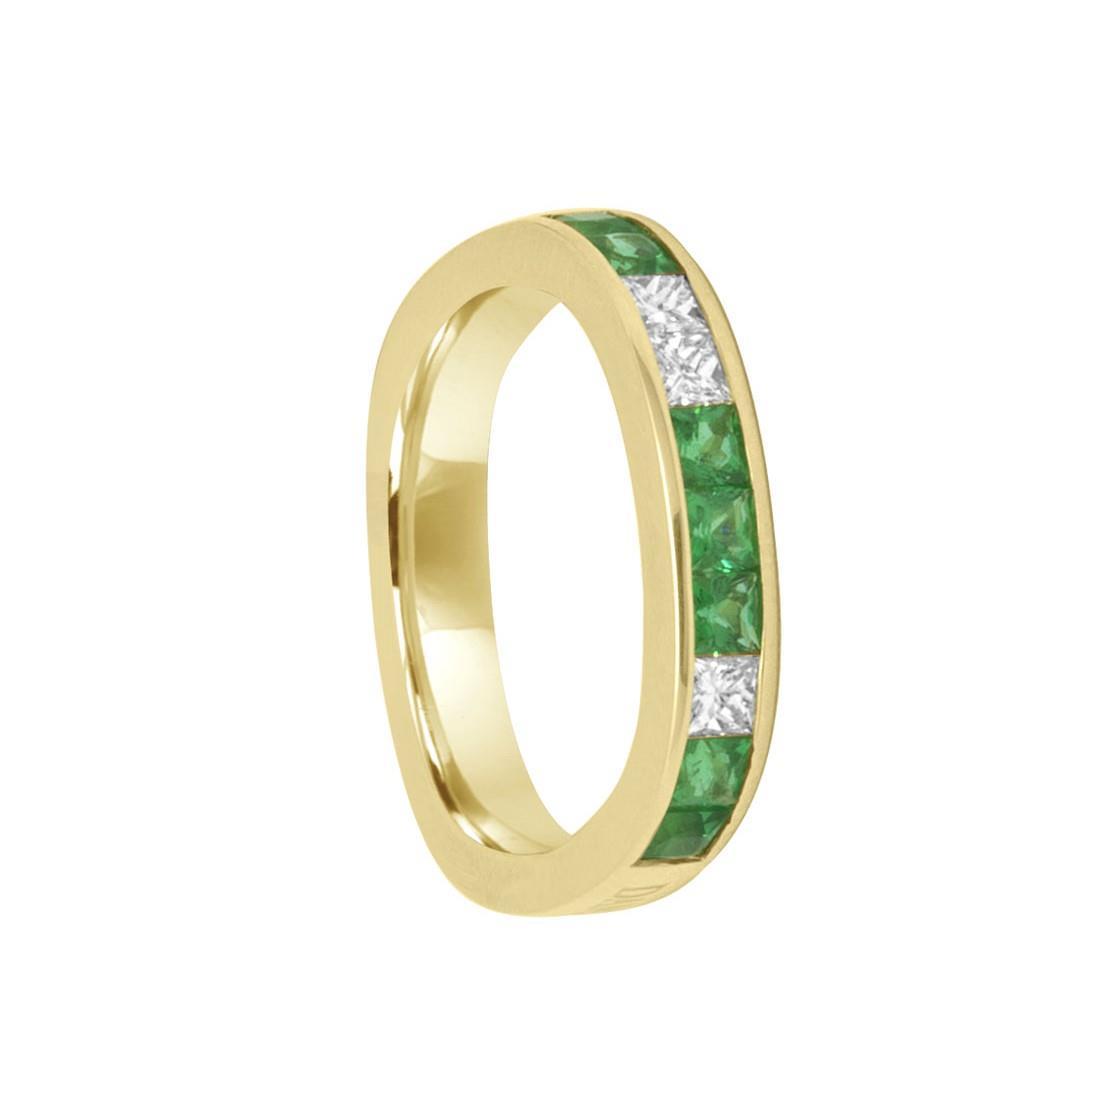 Anello Damiani in oro giallo con diamanti ct 0,25 - DAMIANI